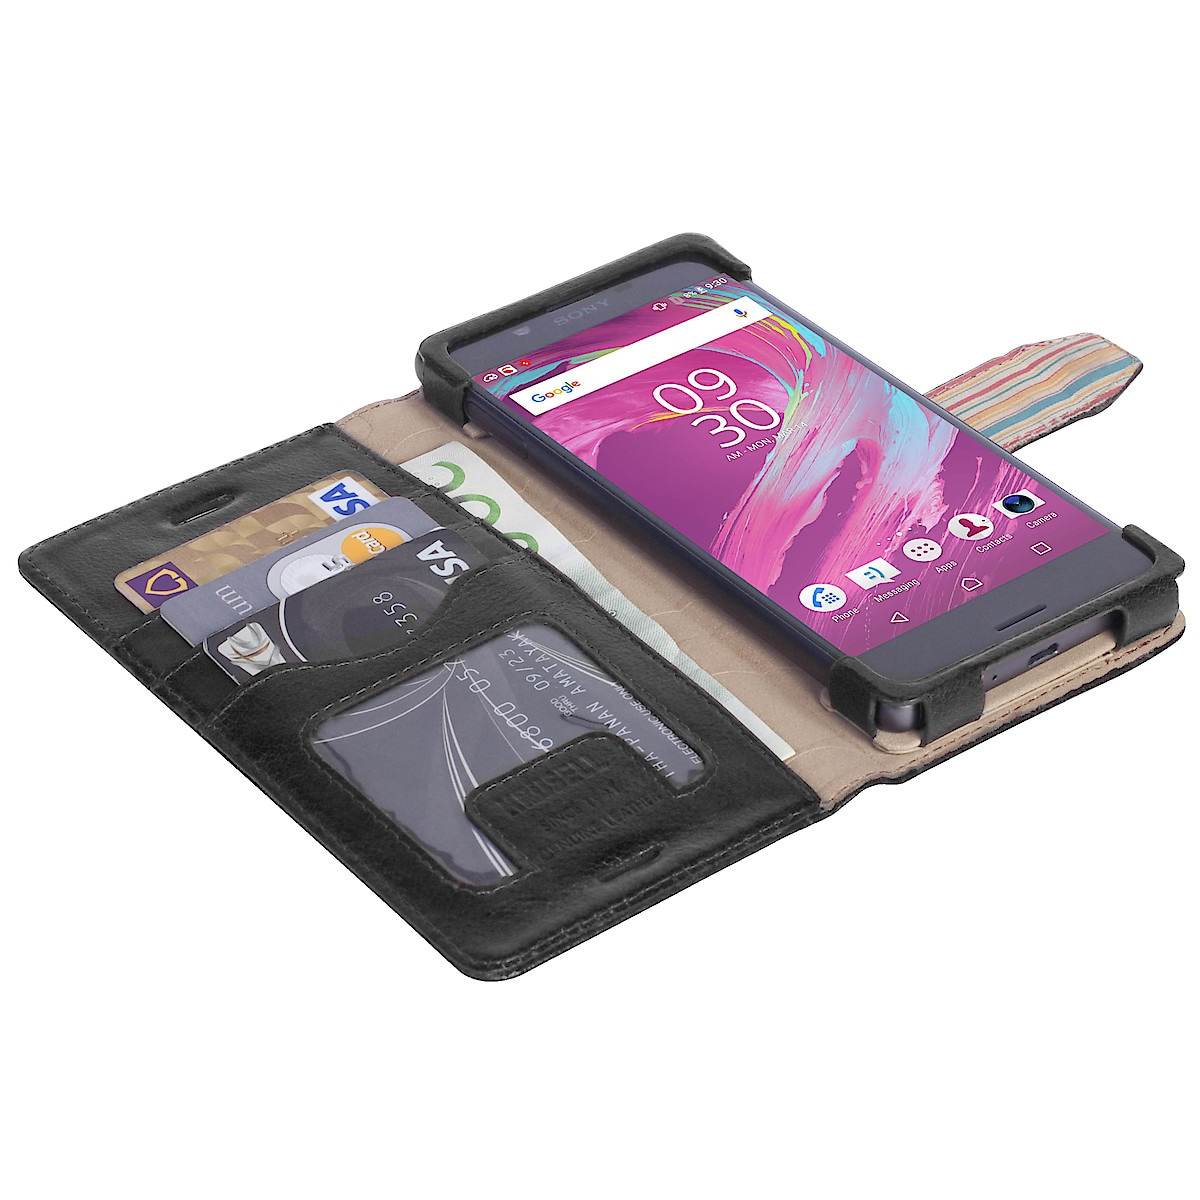 Lompakkokotelo Sony Xperia X:lle ja X Performancelle, Krusell Sigtuna FolioWallet